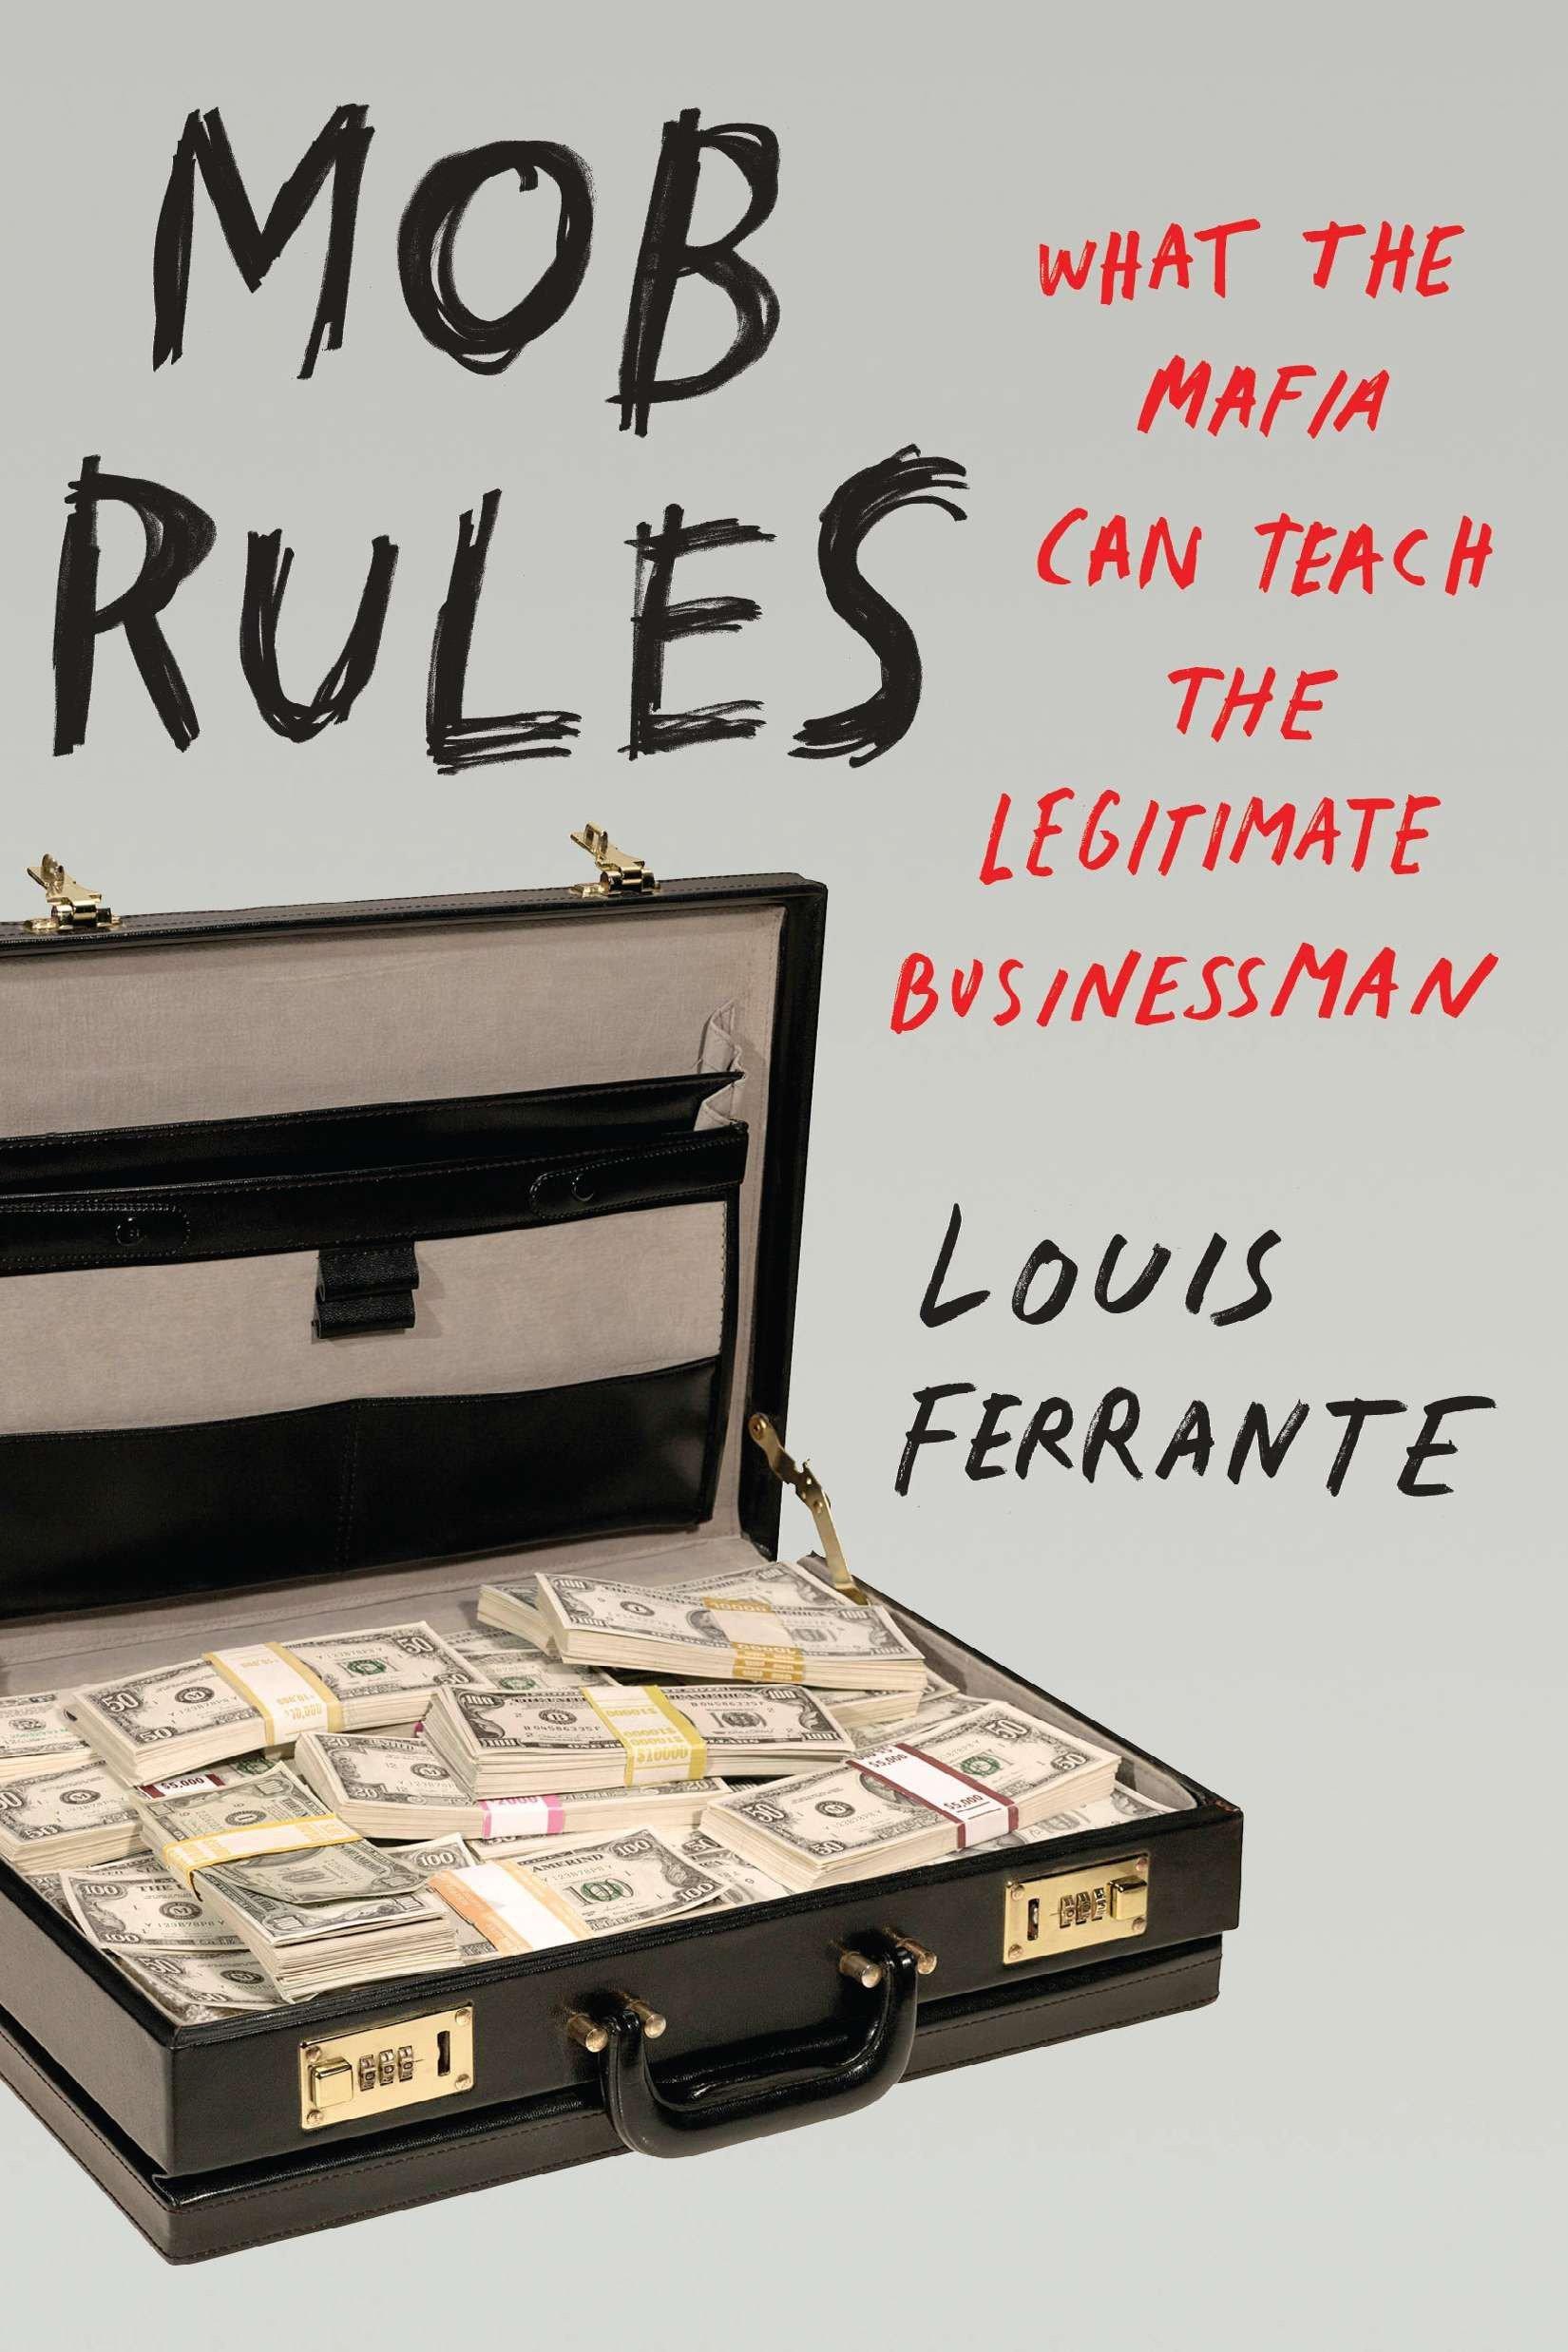 Mob Rules: What the Mafia Can Teach the Legitimate